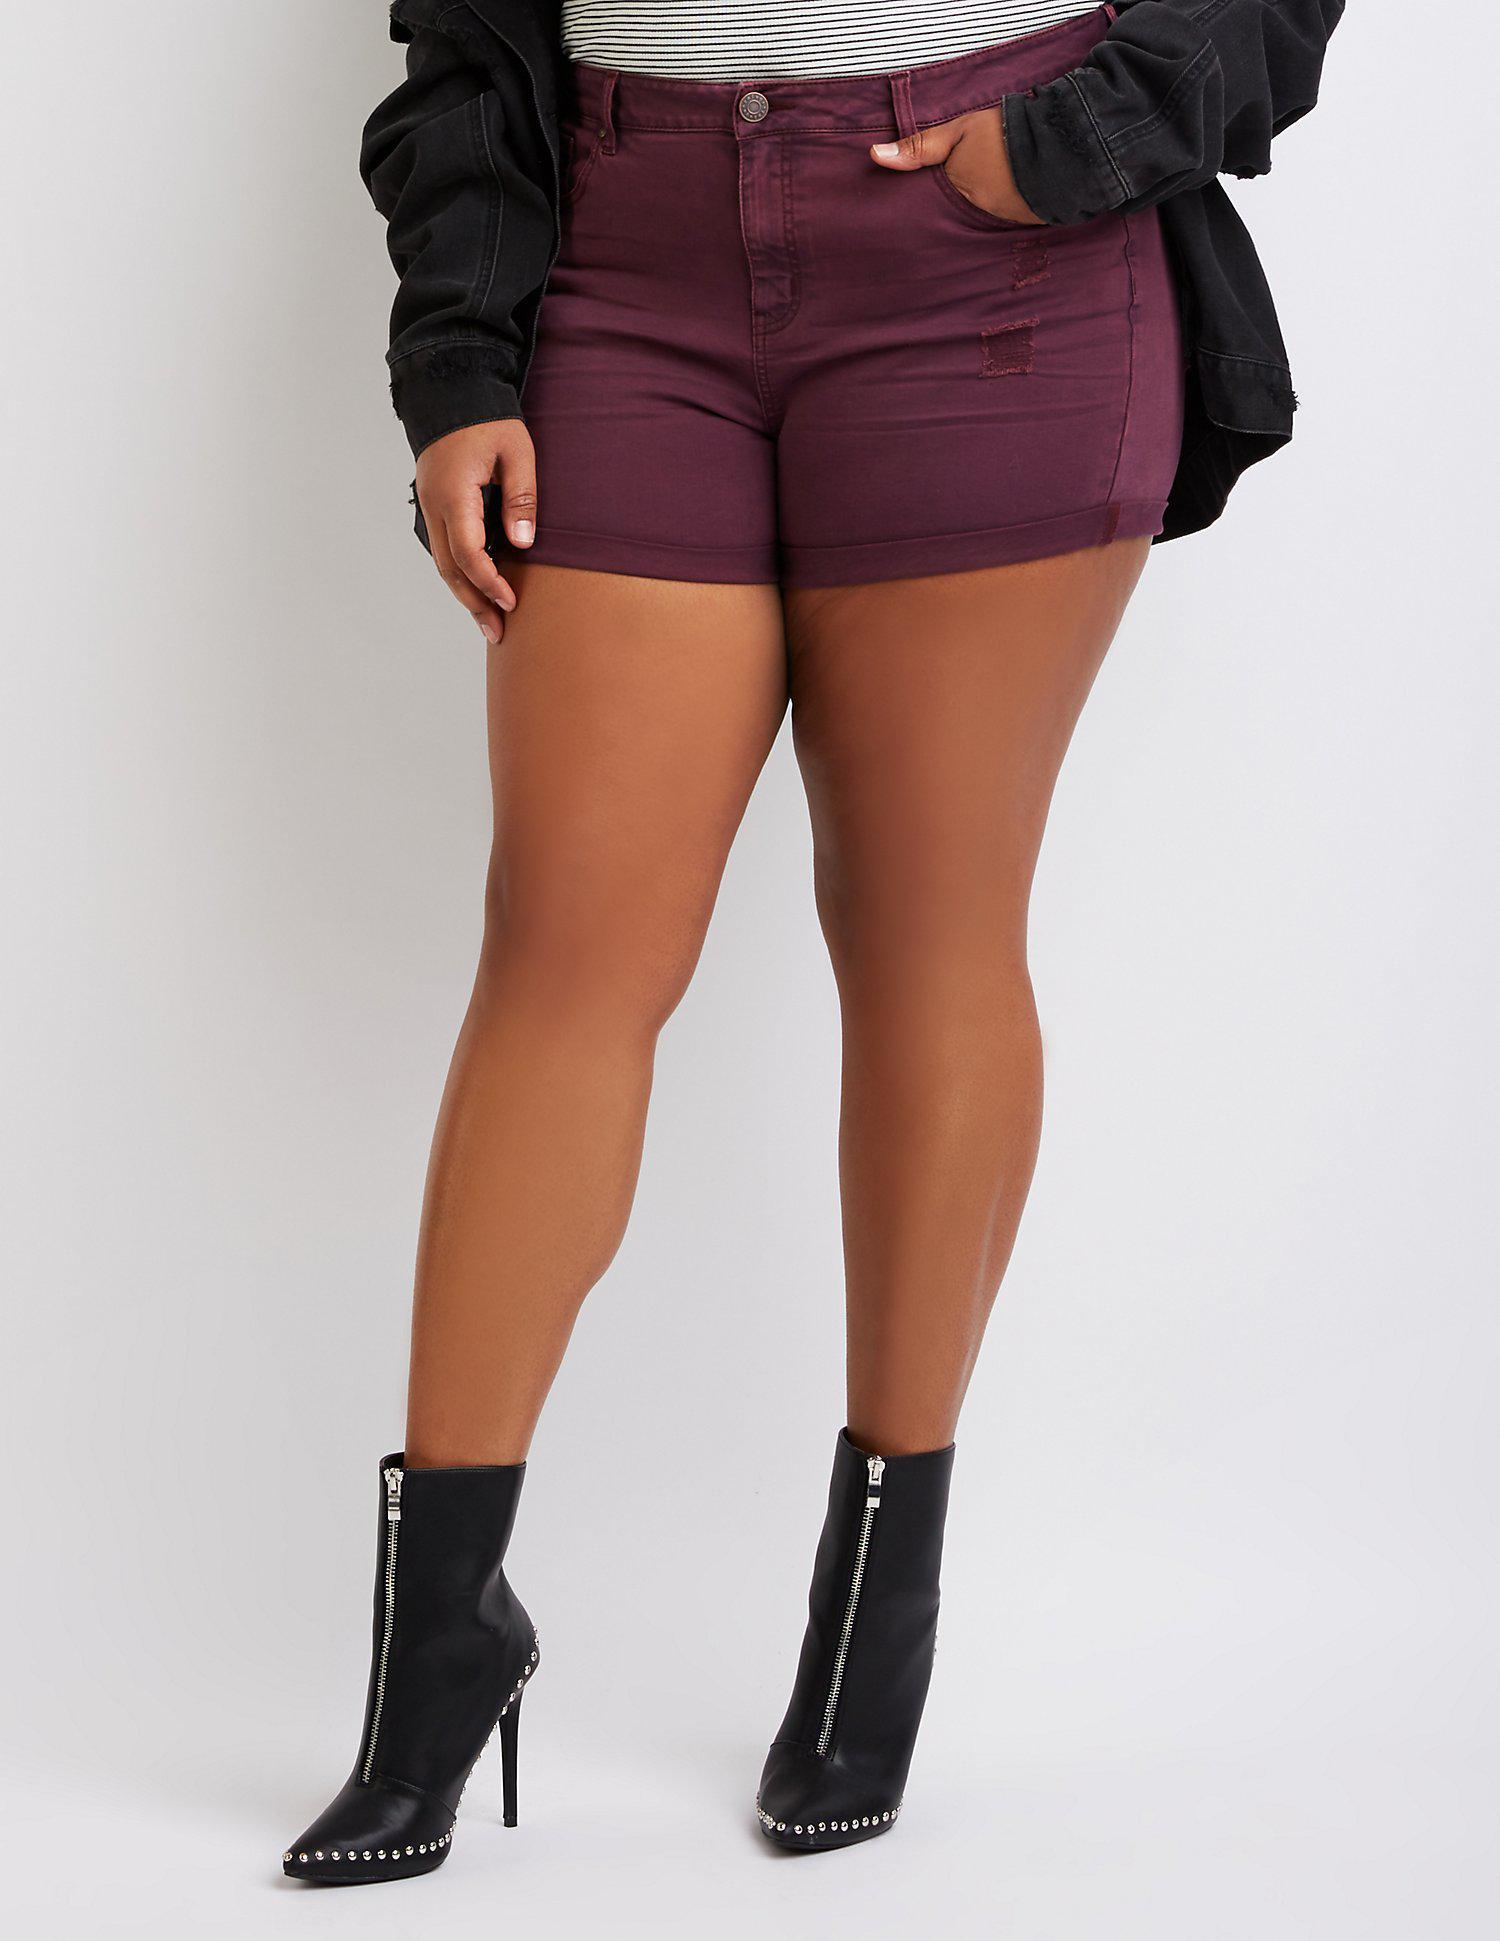 b8a4760e3e Charlotte Russe. Women's Purple Plus Size Refuge Destroyed Girlfriend Shorts